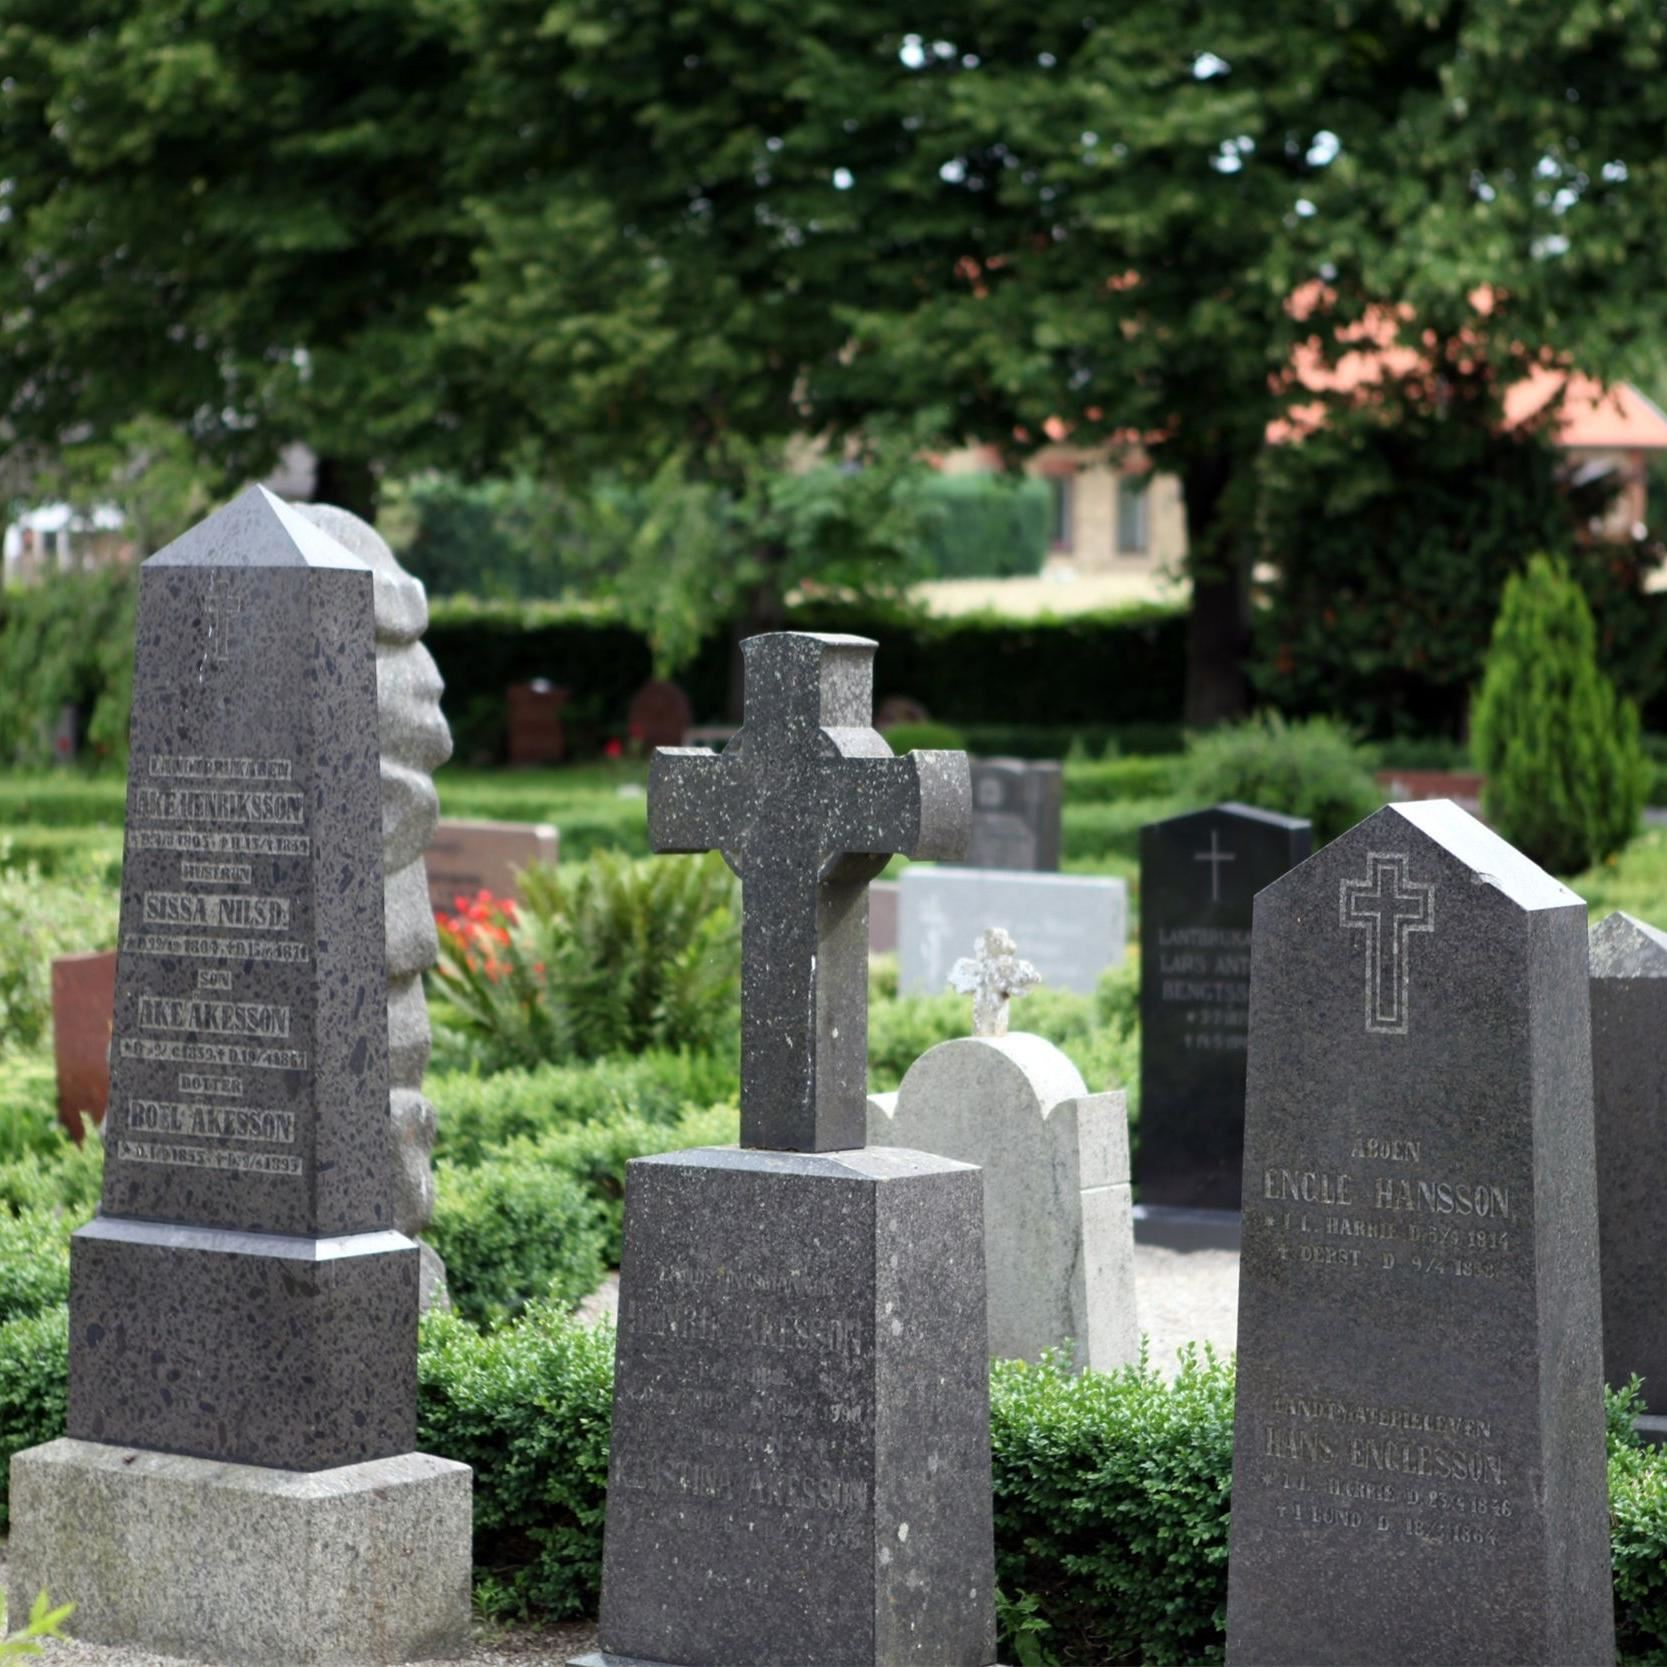 © Kävlinge kommun, Lilla Harrie Kirche